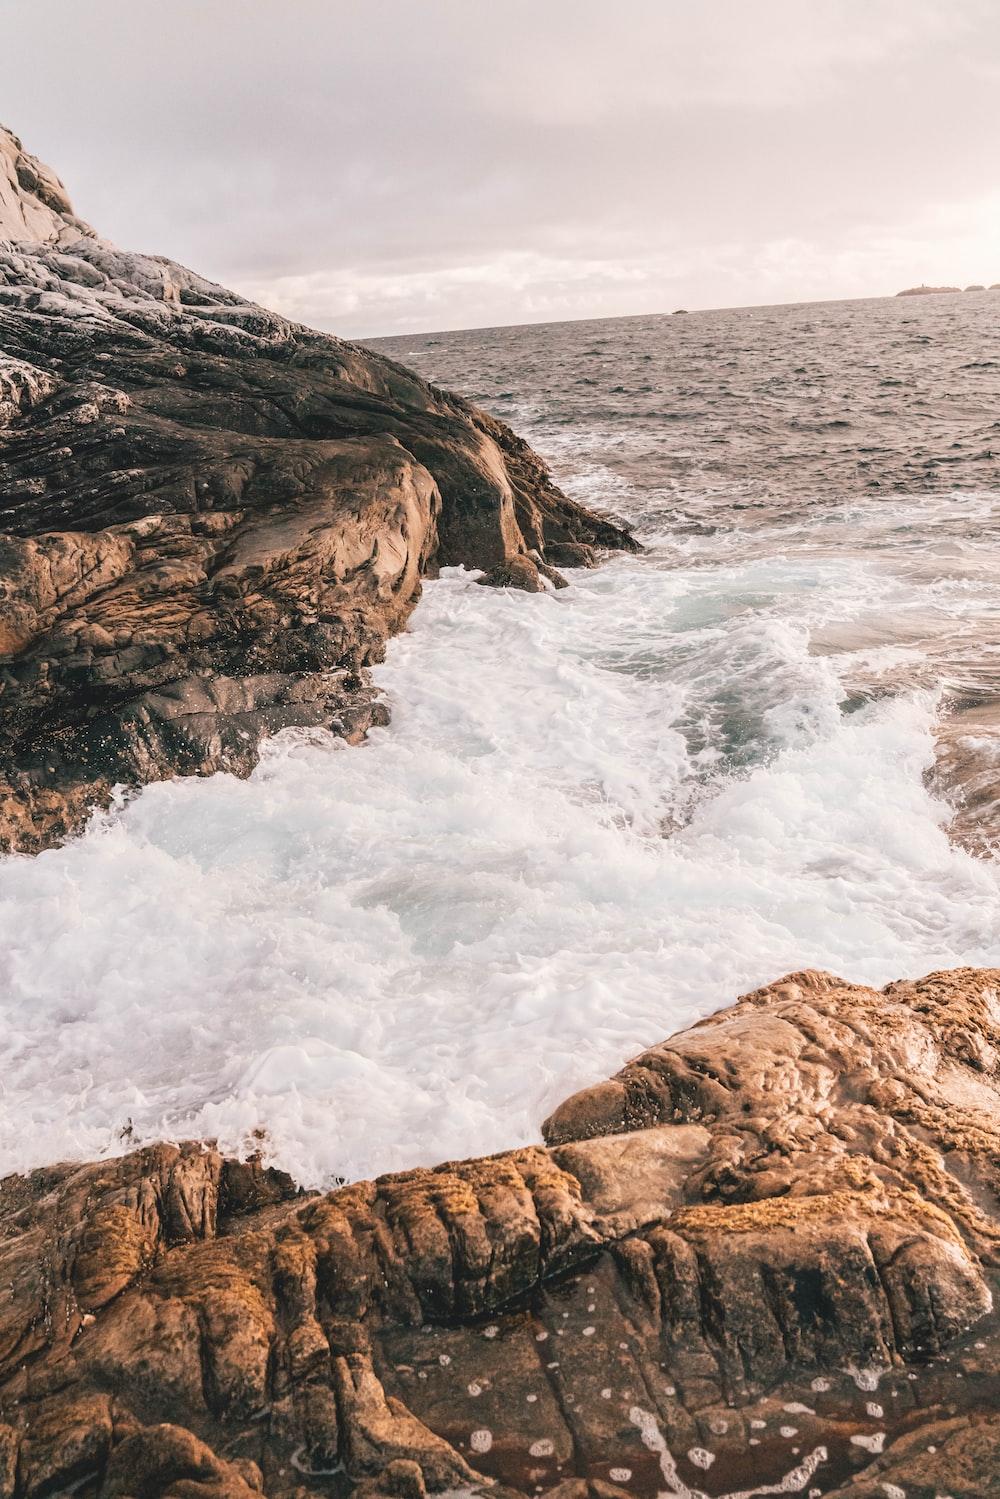 waves crashing on rock boulders